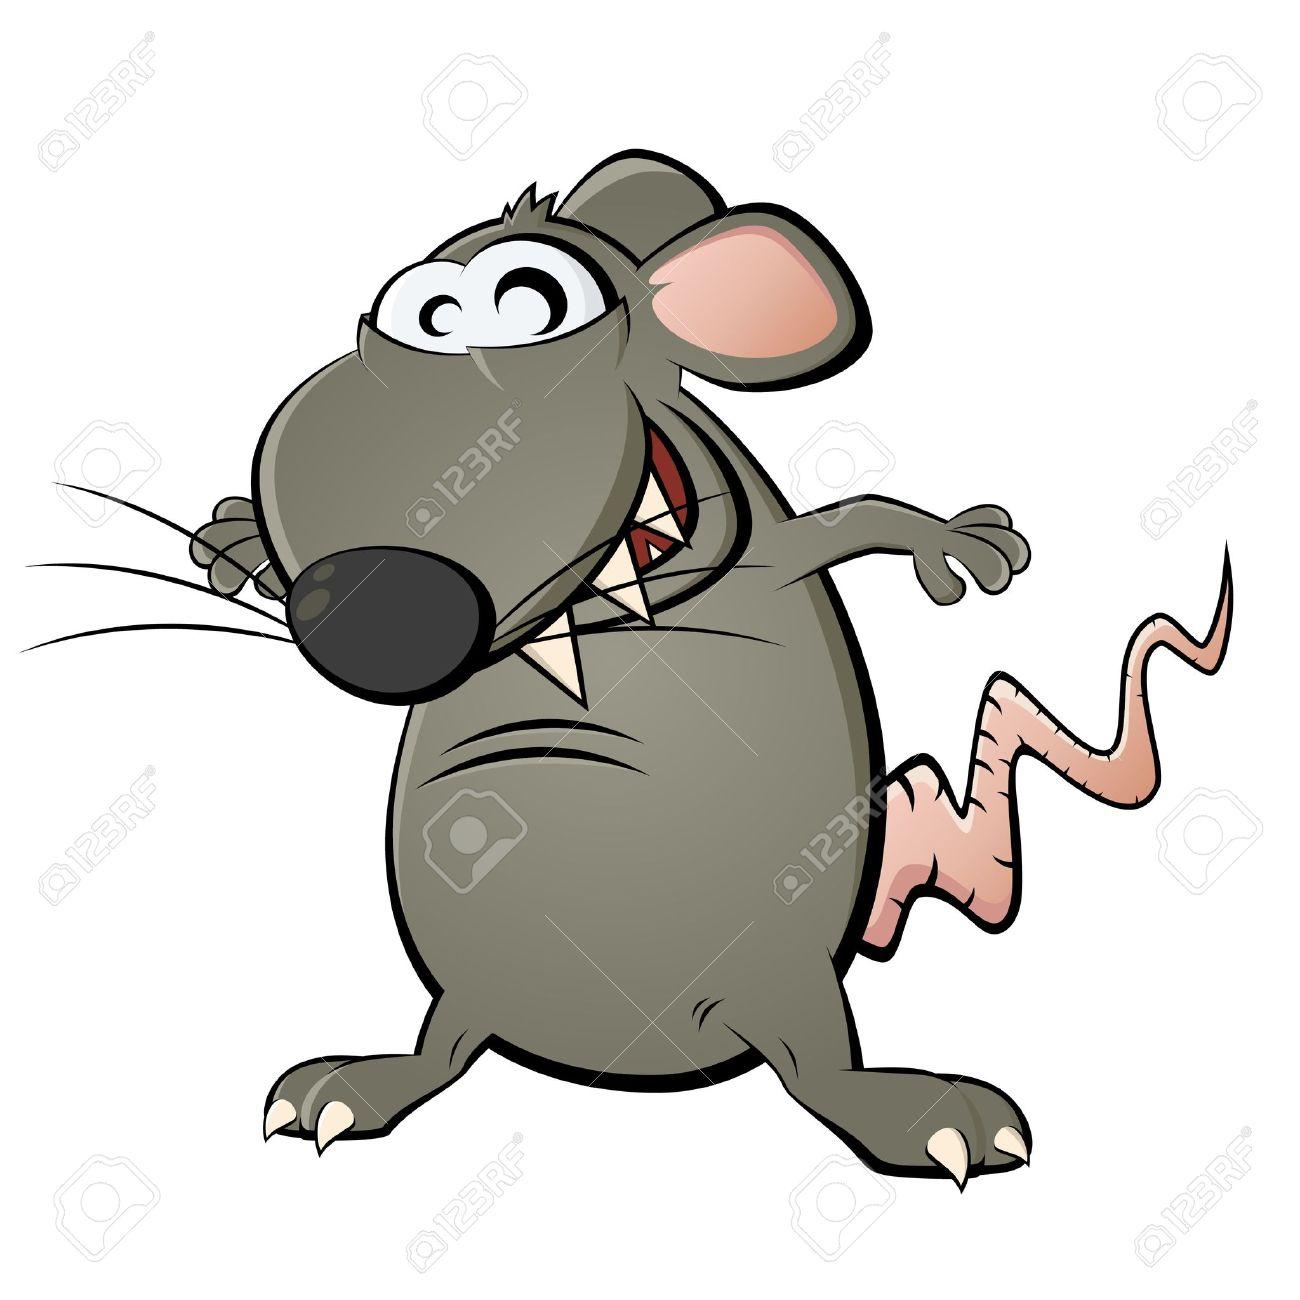 Funny Cartoon Rat Royalty Free Cliparts, Vectors, And Stock.